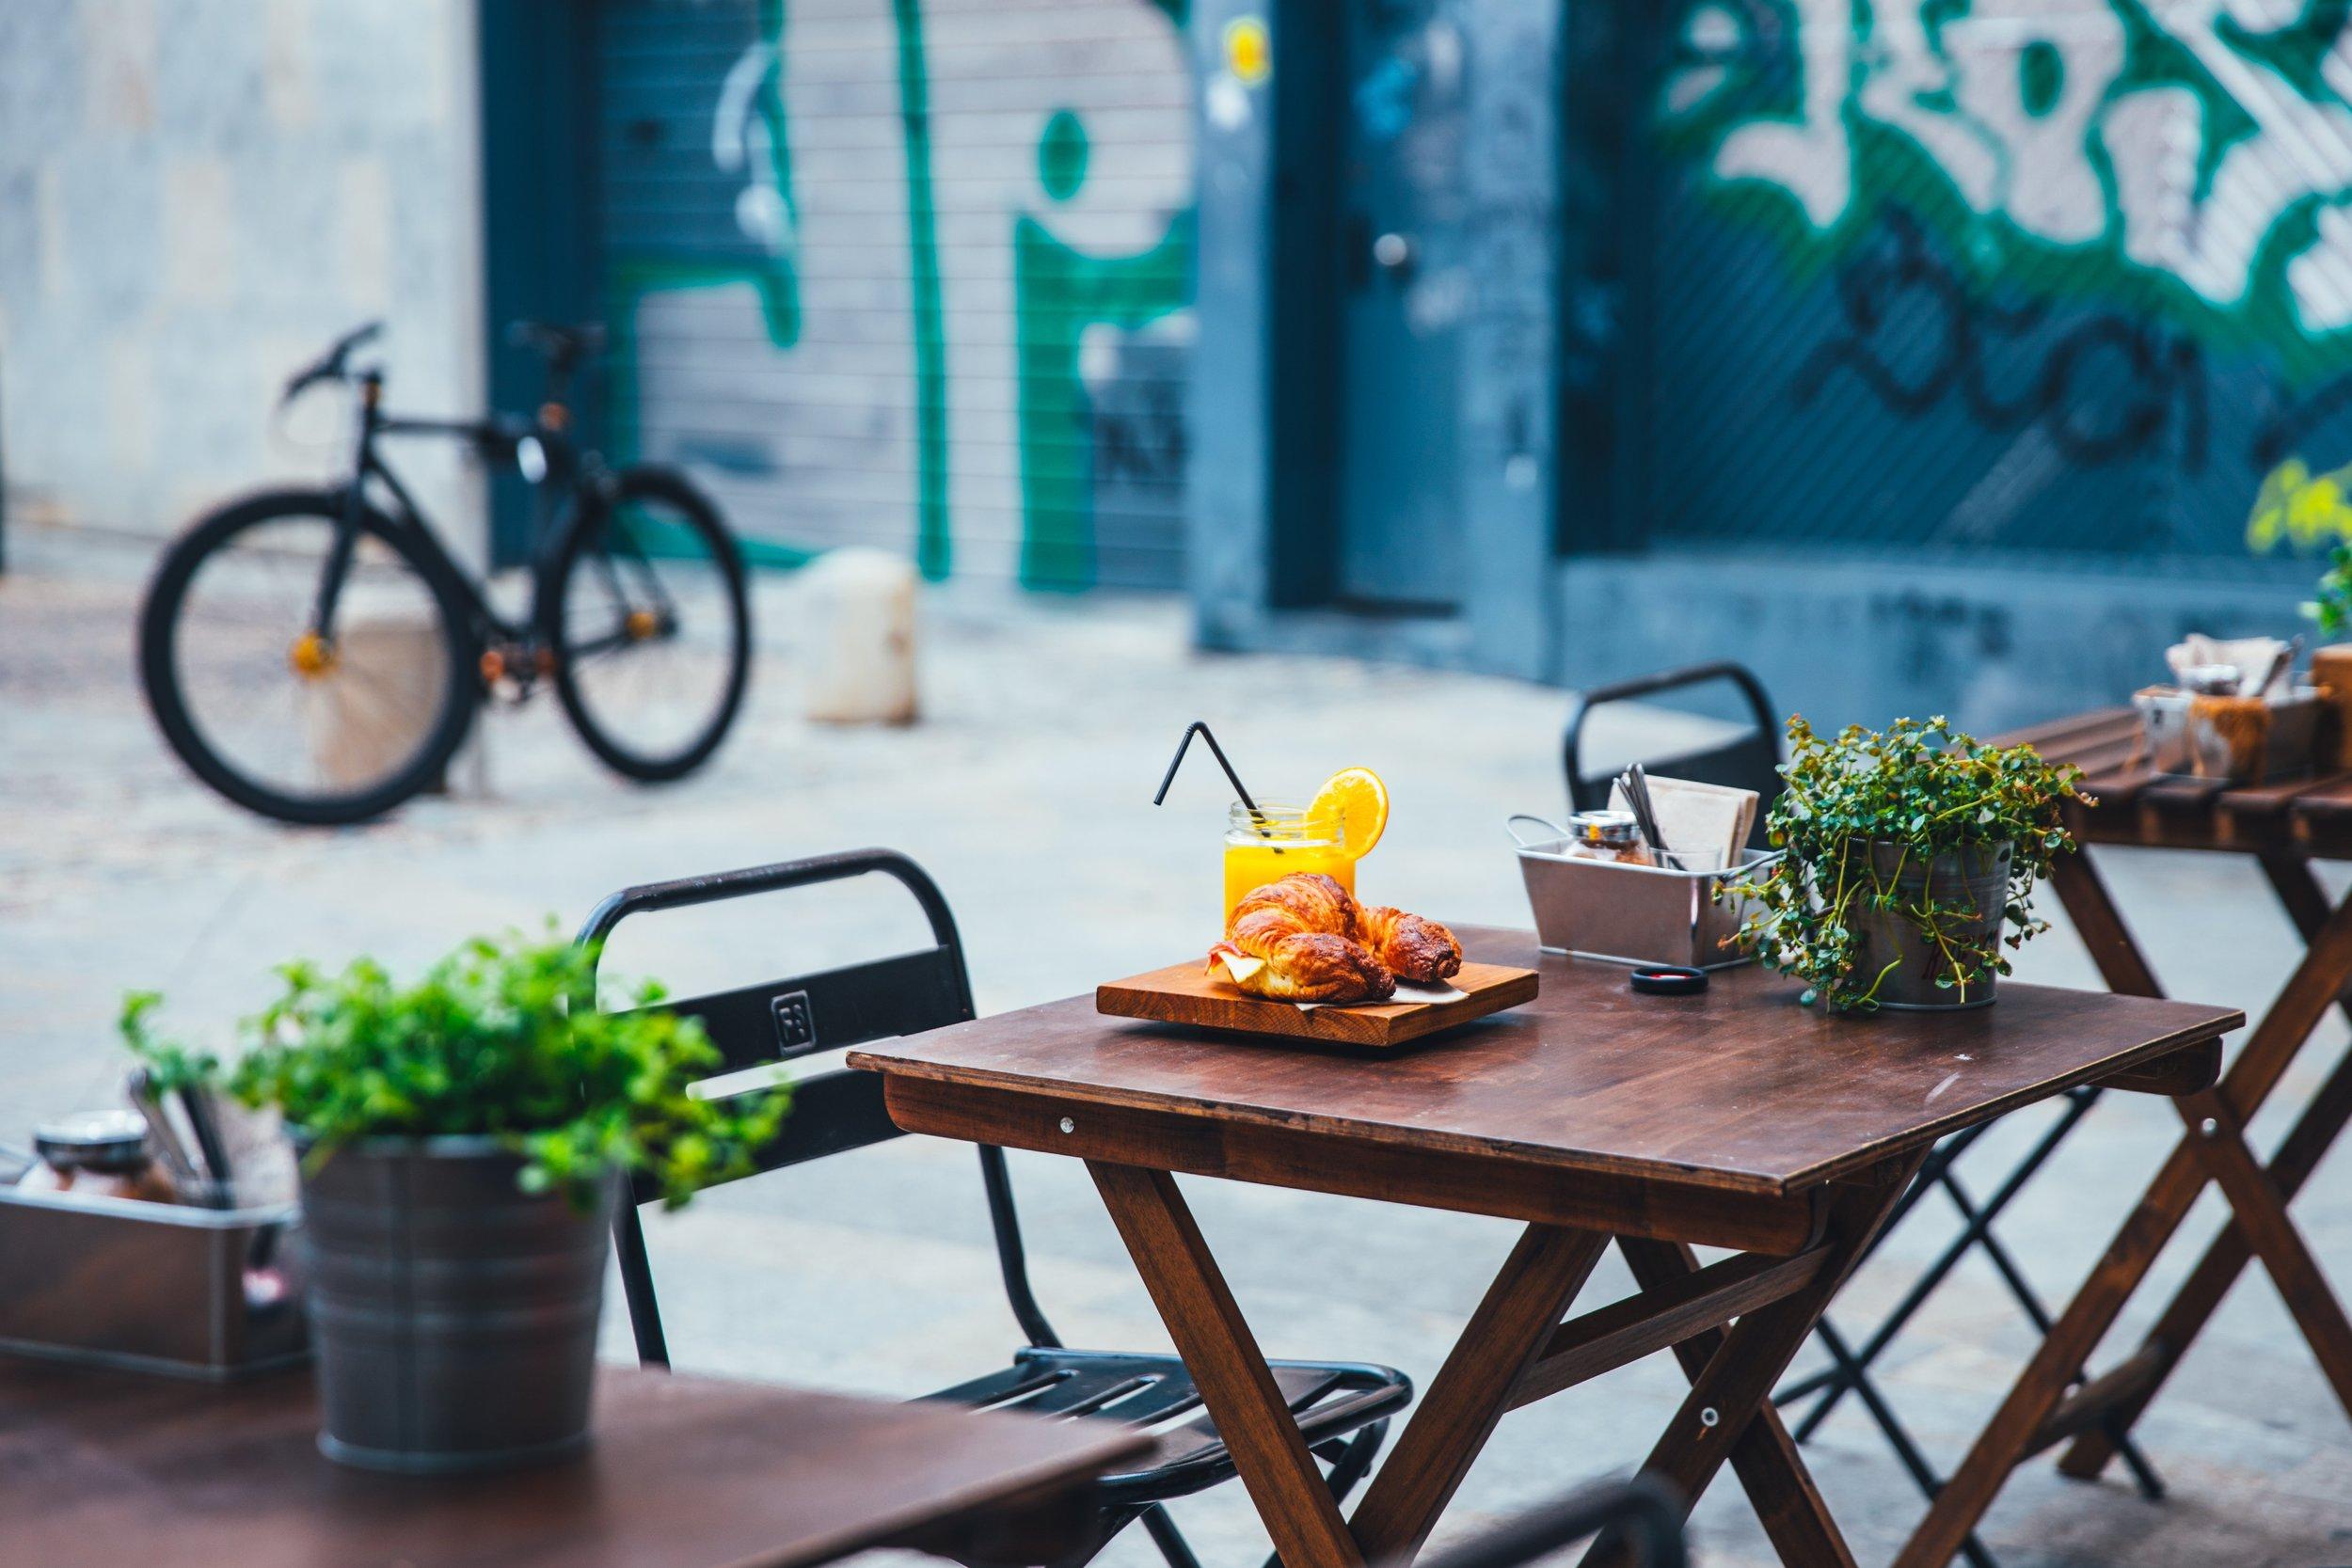 cafe-patio_4460x4460.jpg